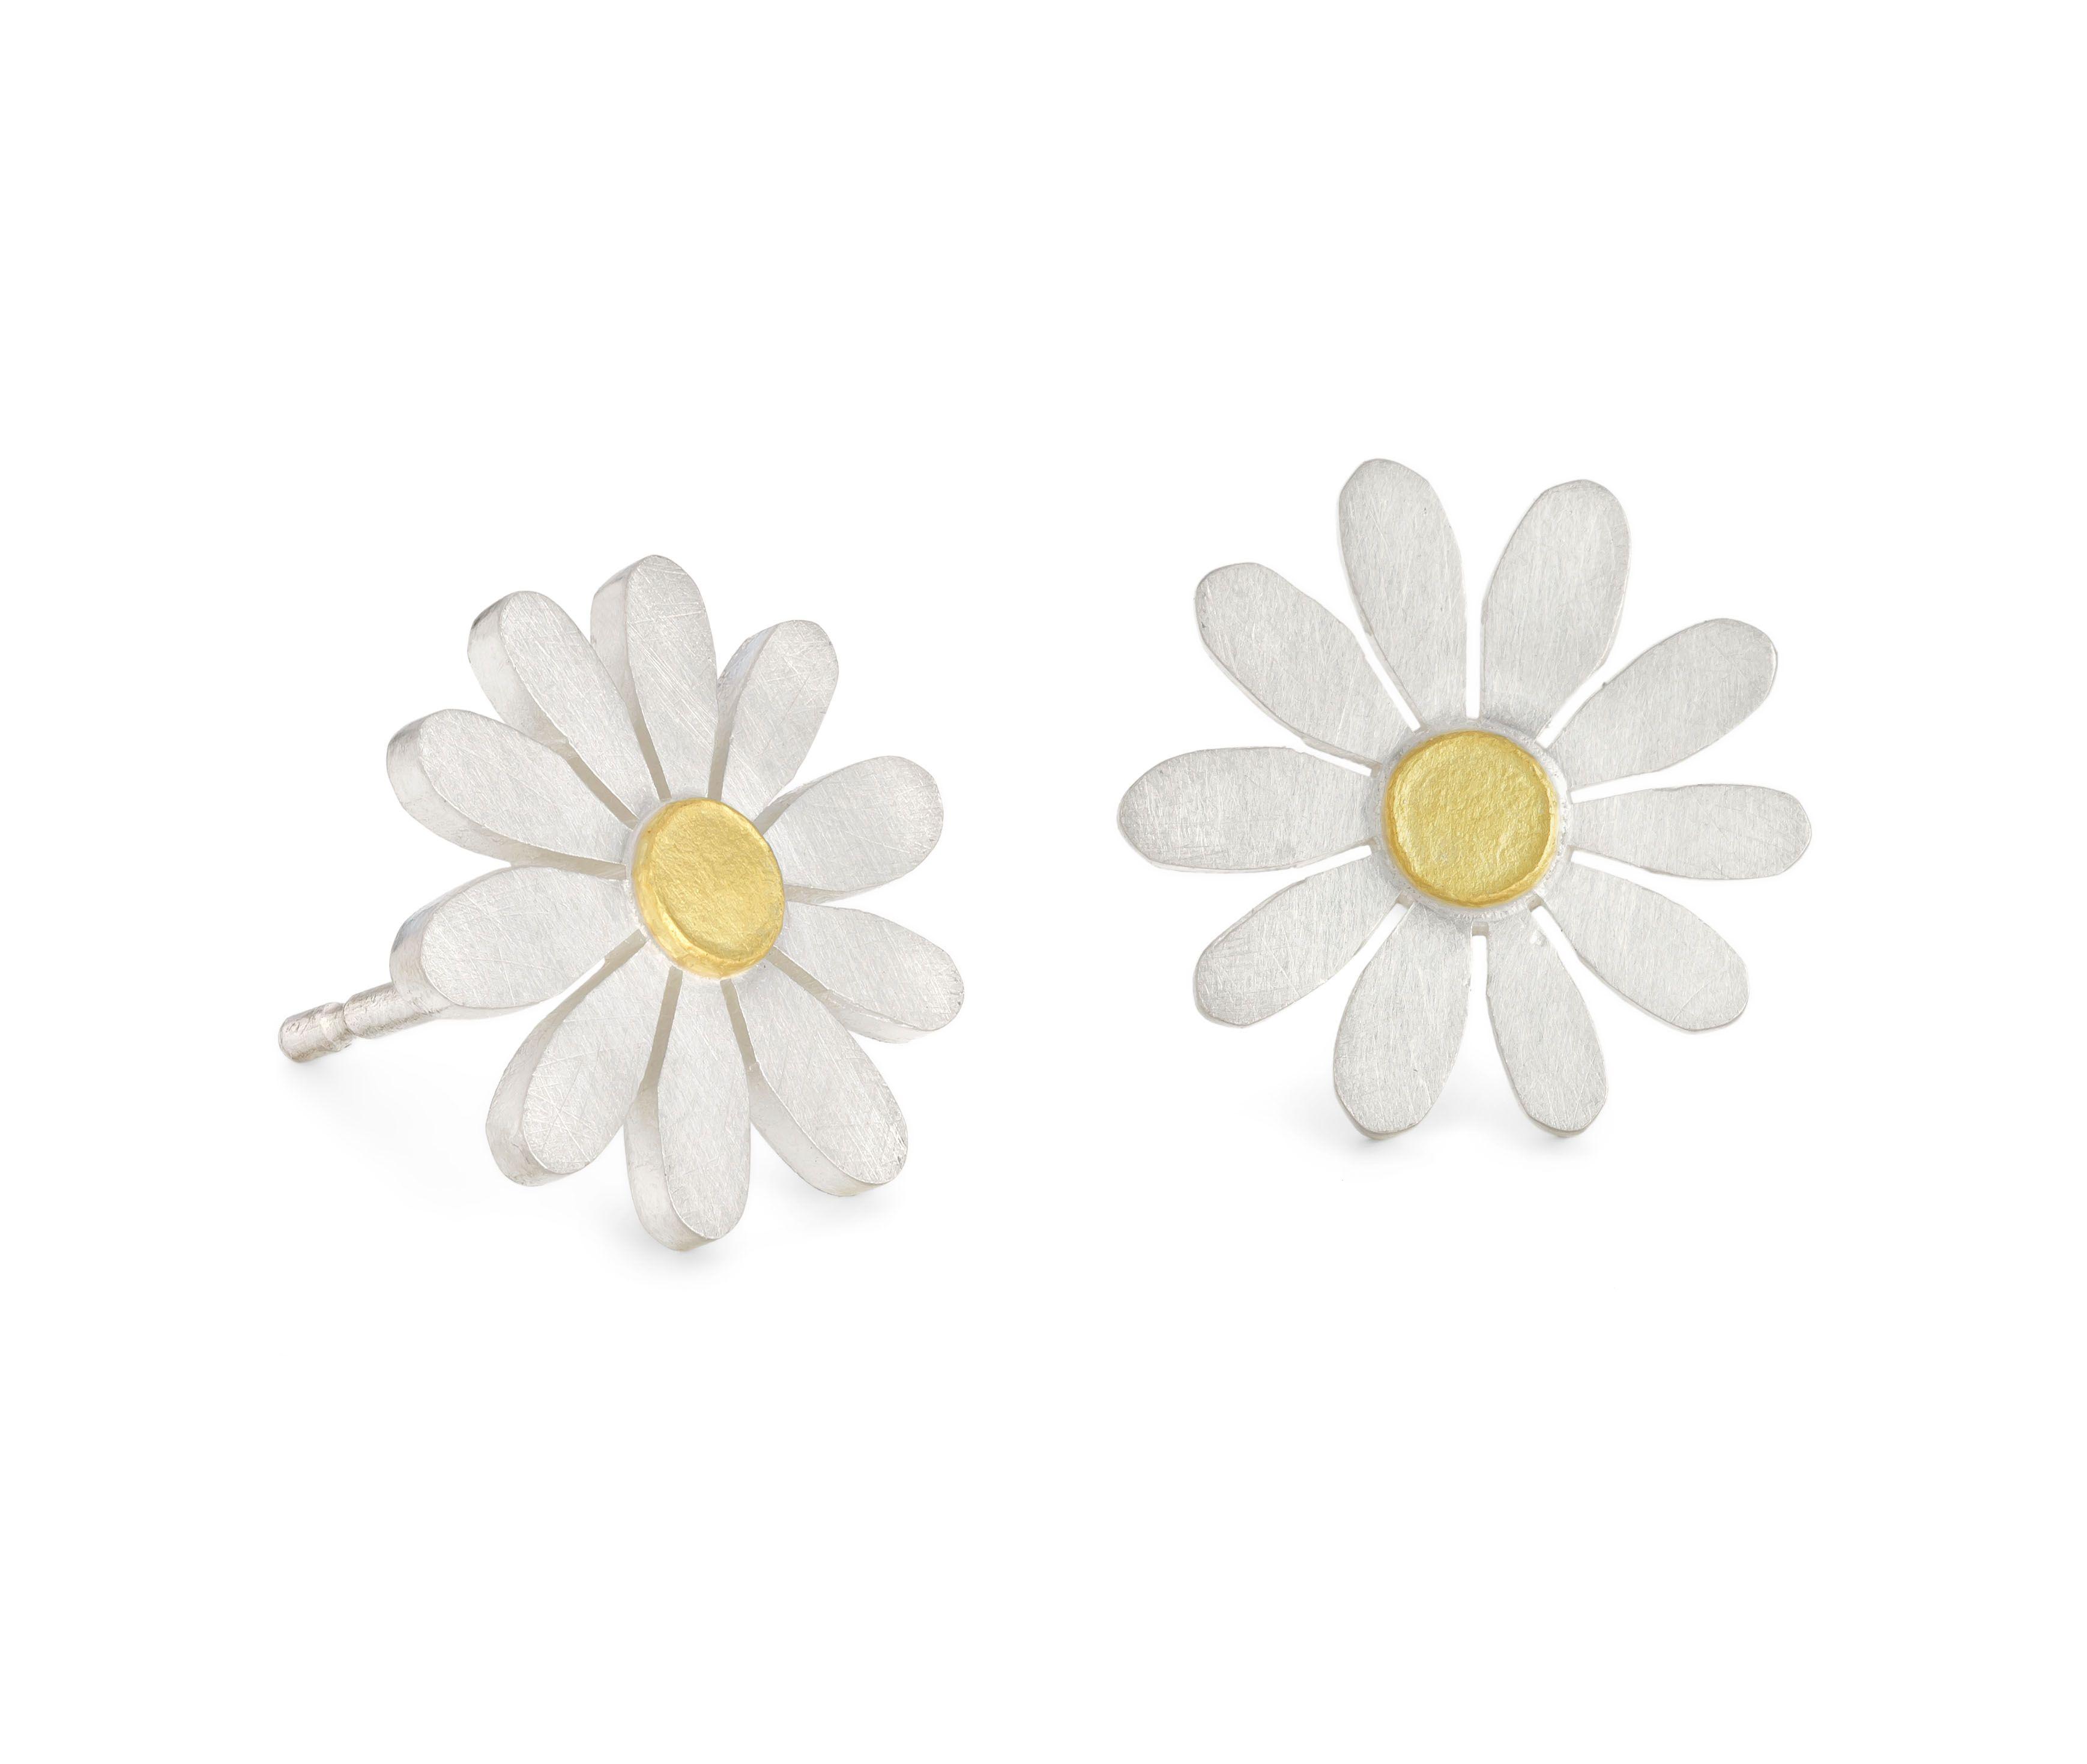 Little Aster Earrings By Diana Greenwood Dianagreenwoodjewellery Aster Flower